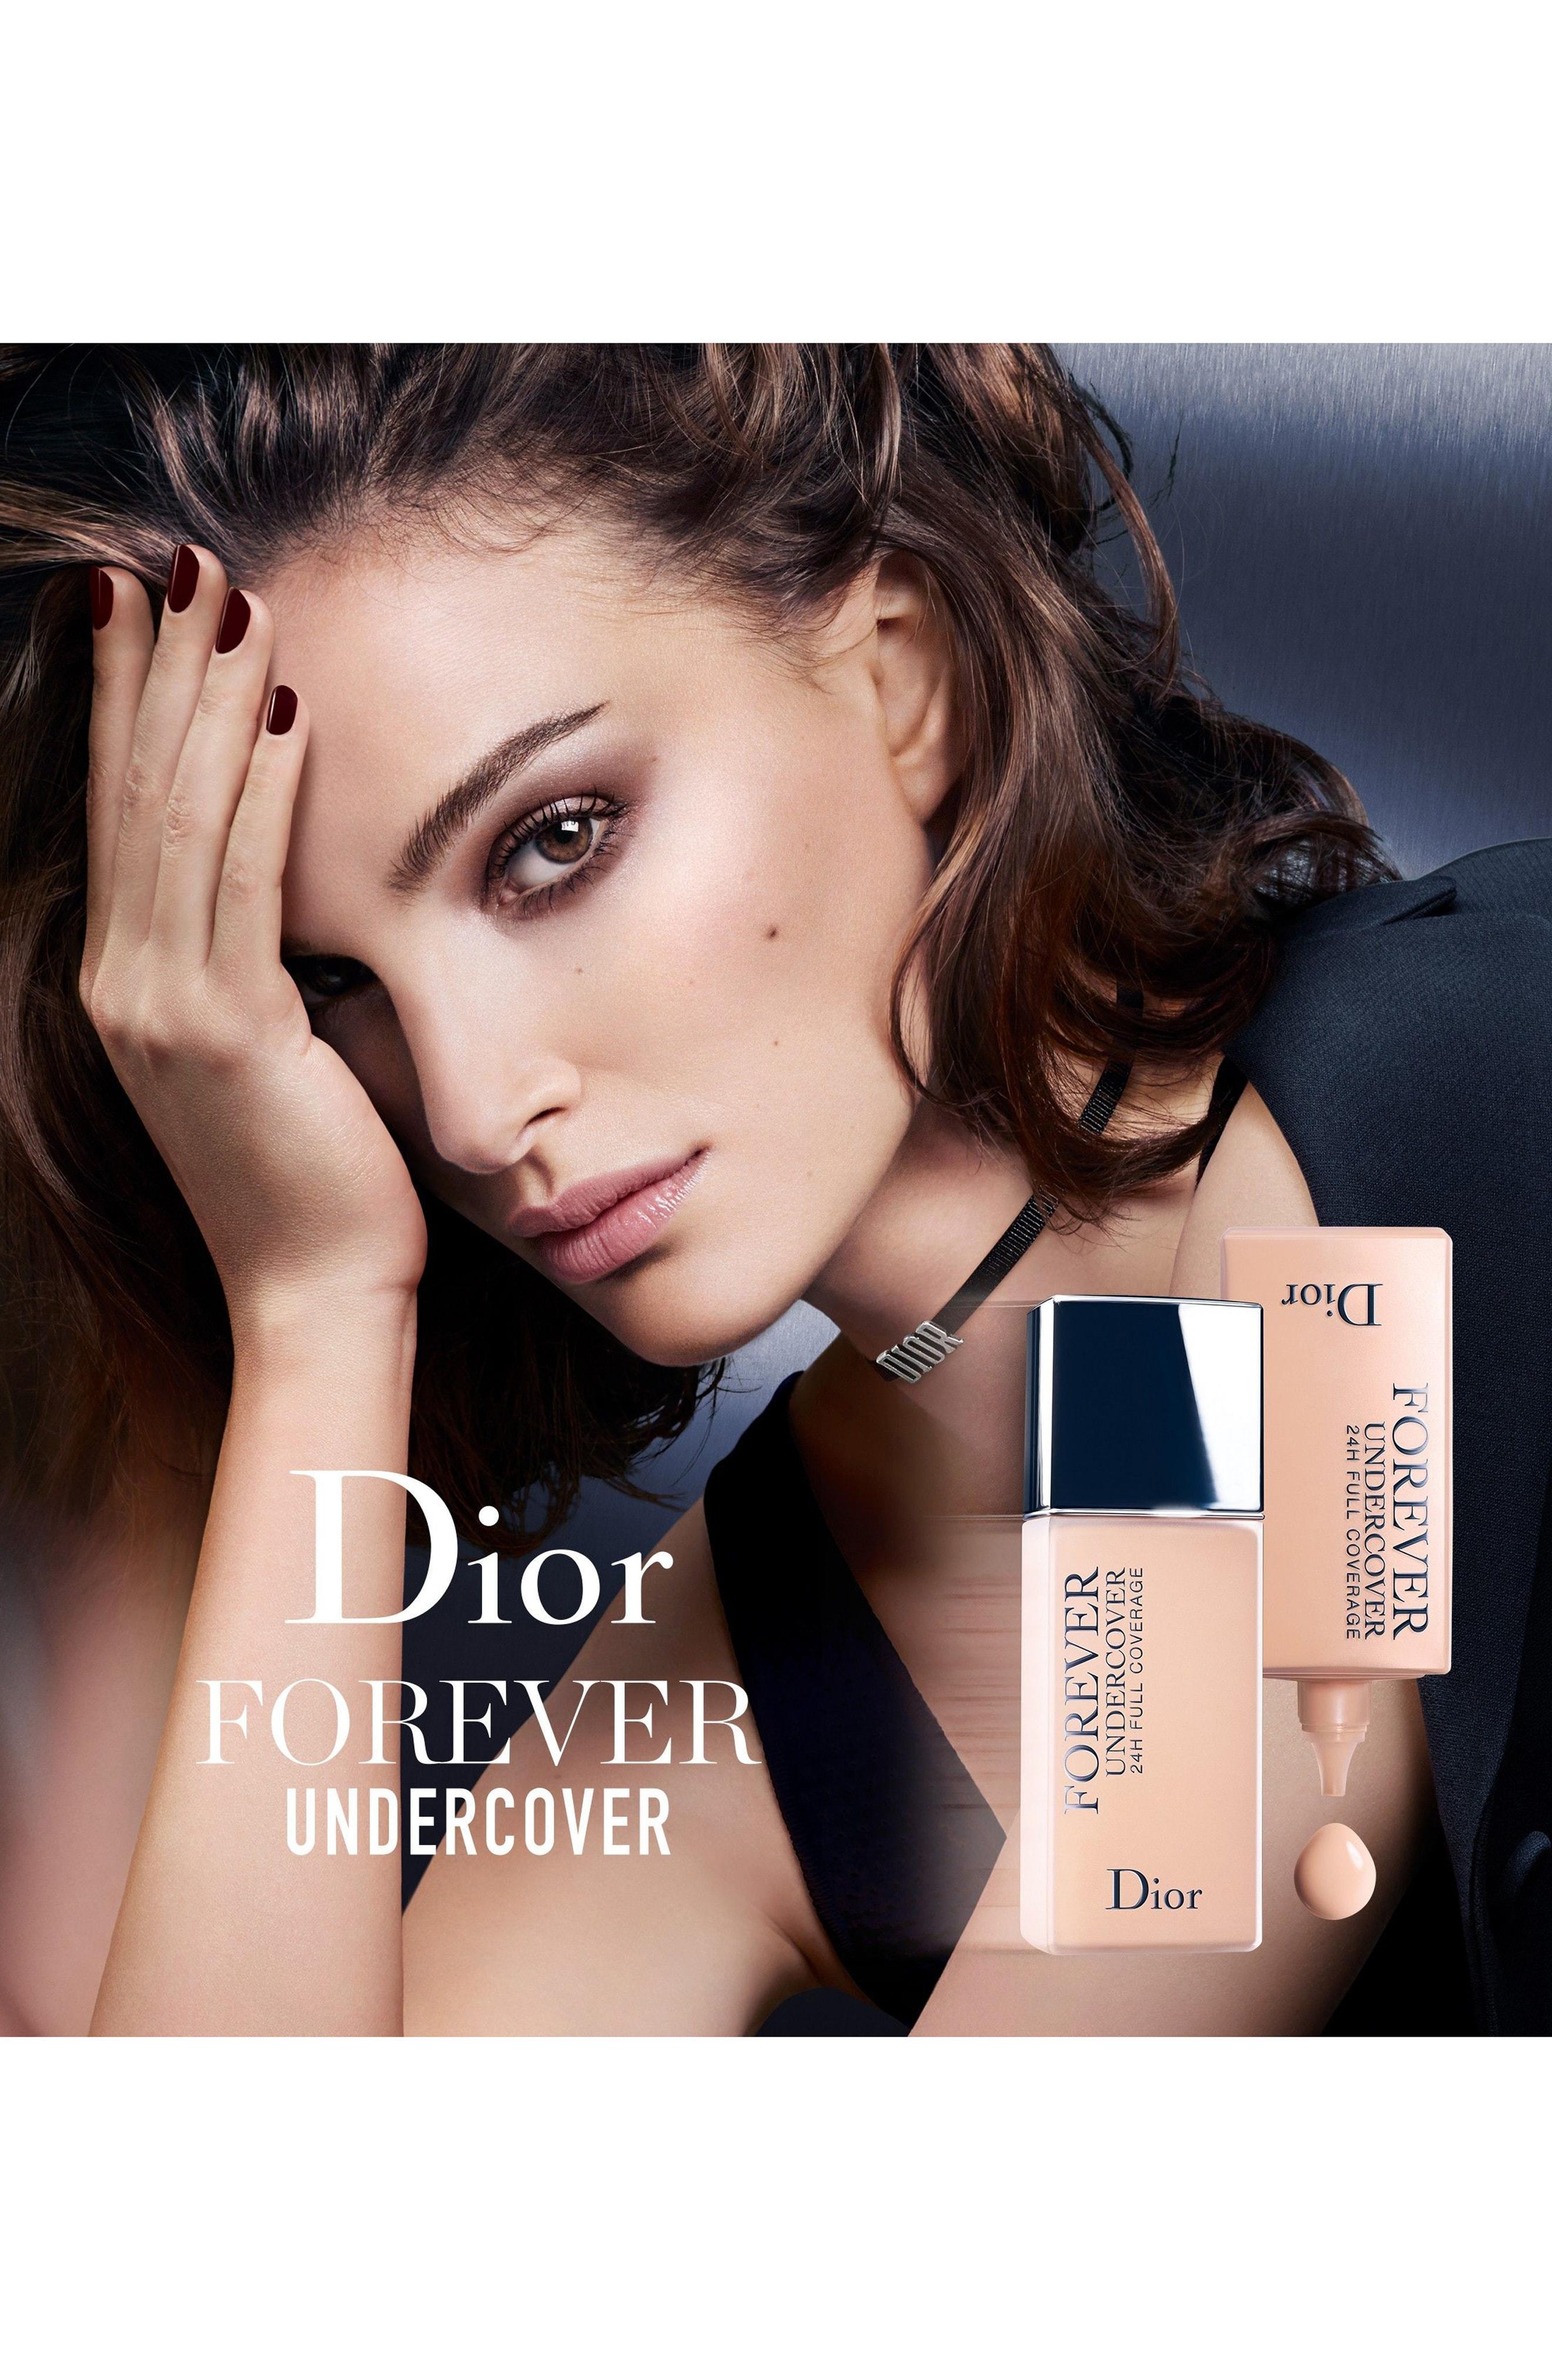 Dior Skin Forever Undercover Foundation 014 Fair Almond 1.3 Oz/ 40 Ml